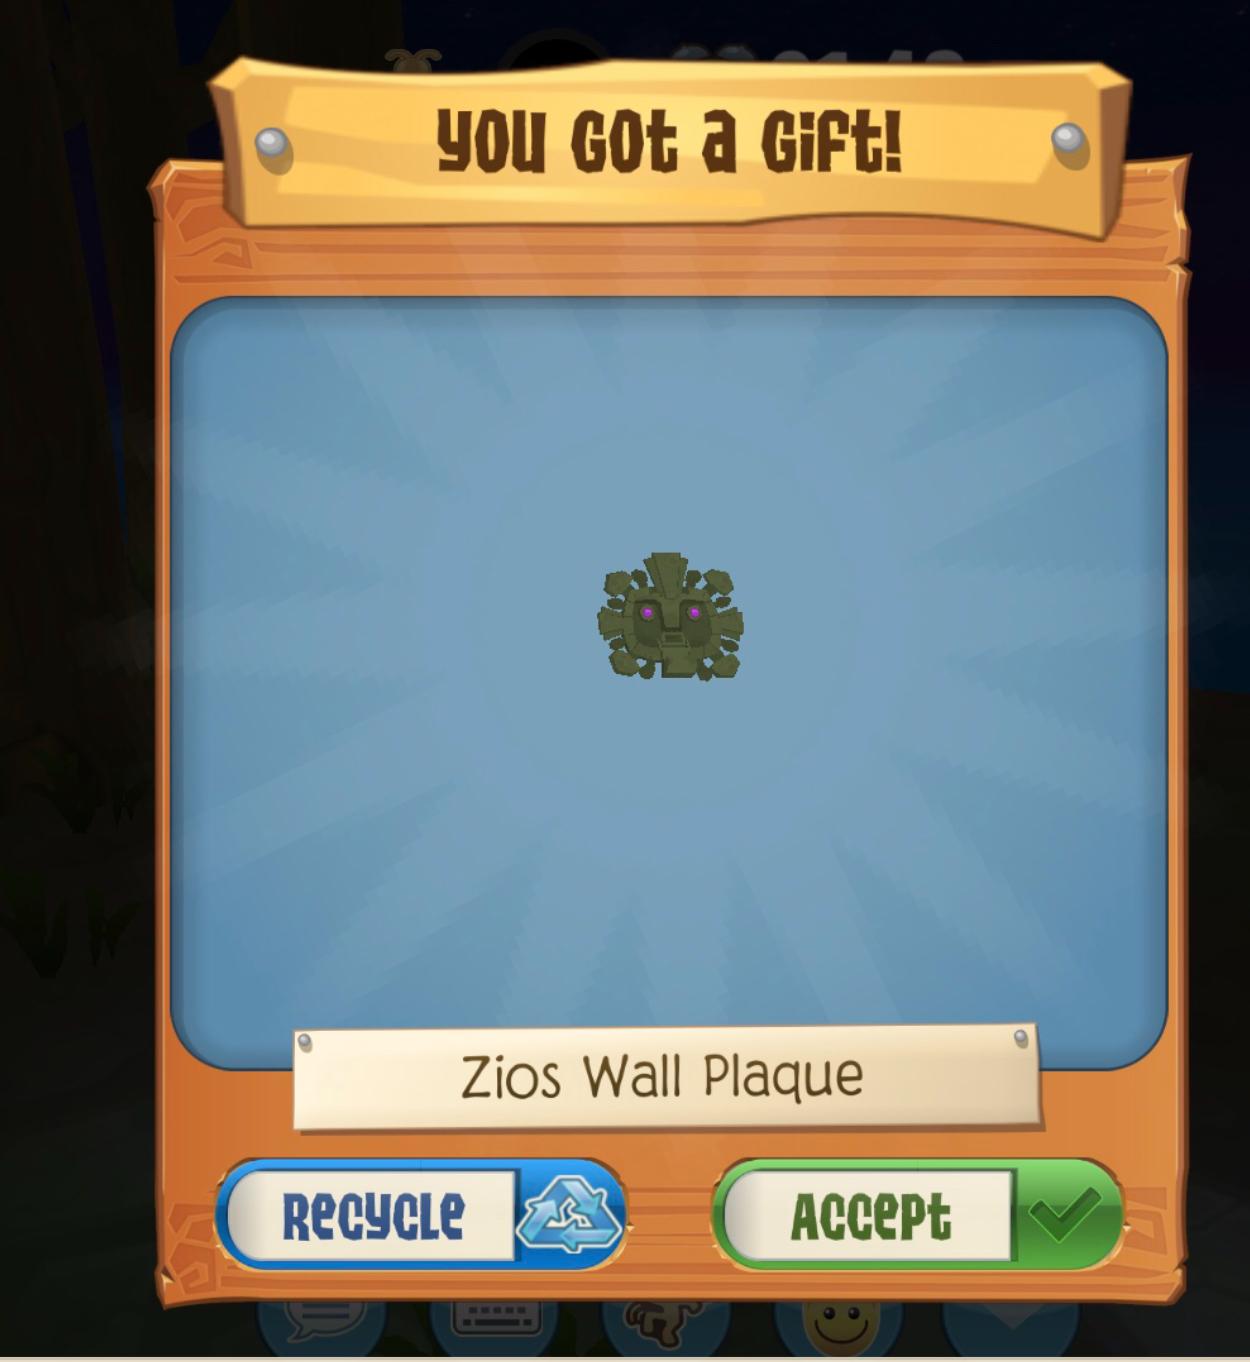 Zios Wall Plaque